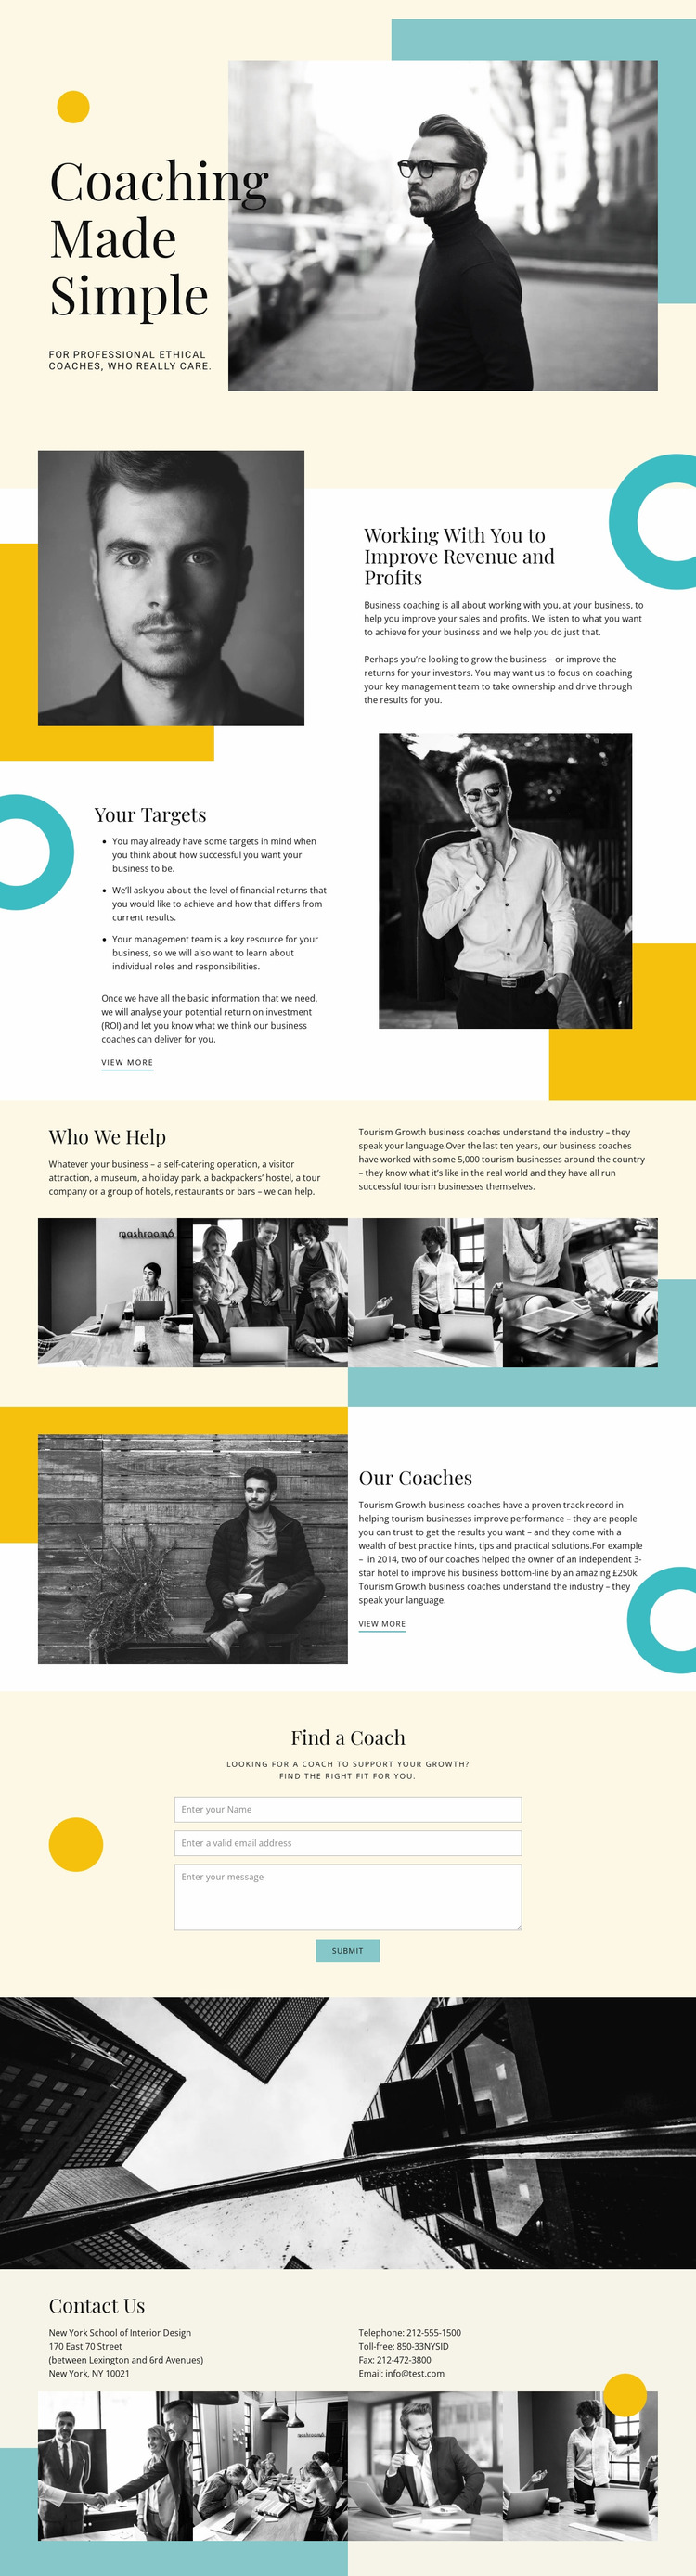 Coaching Company Website Mockup